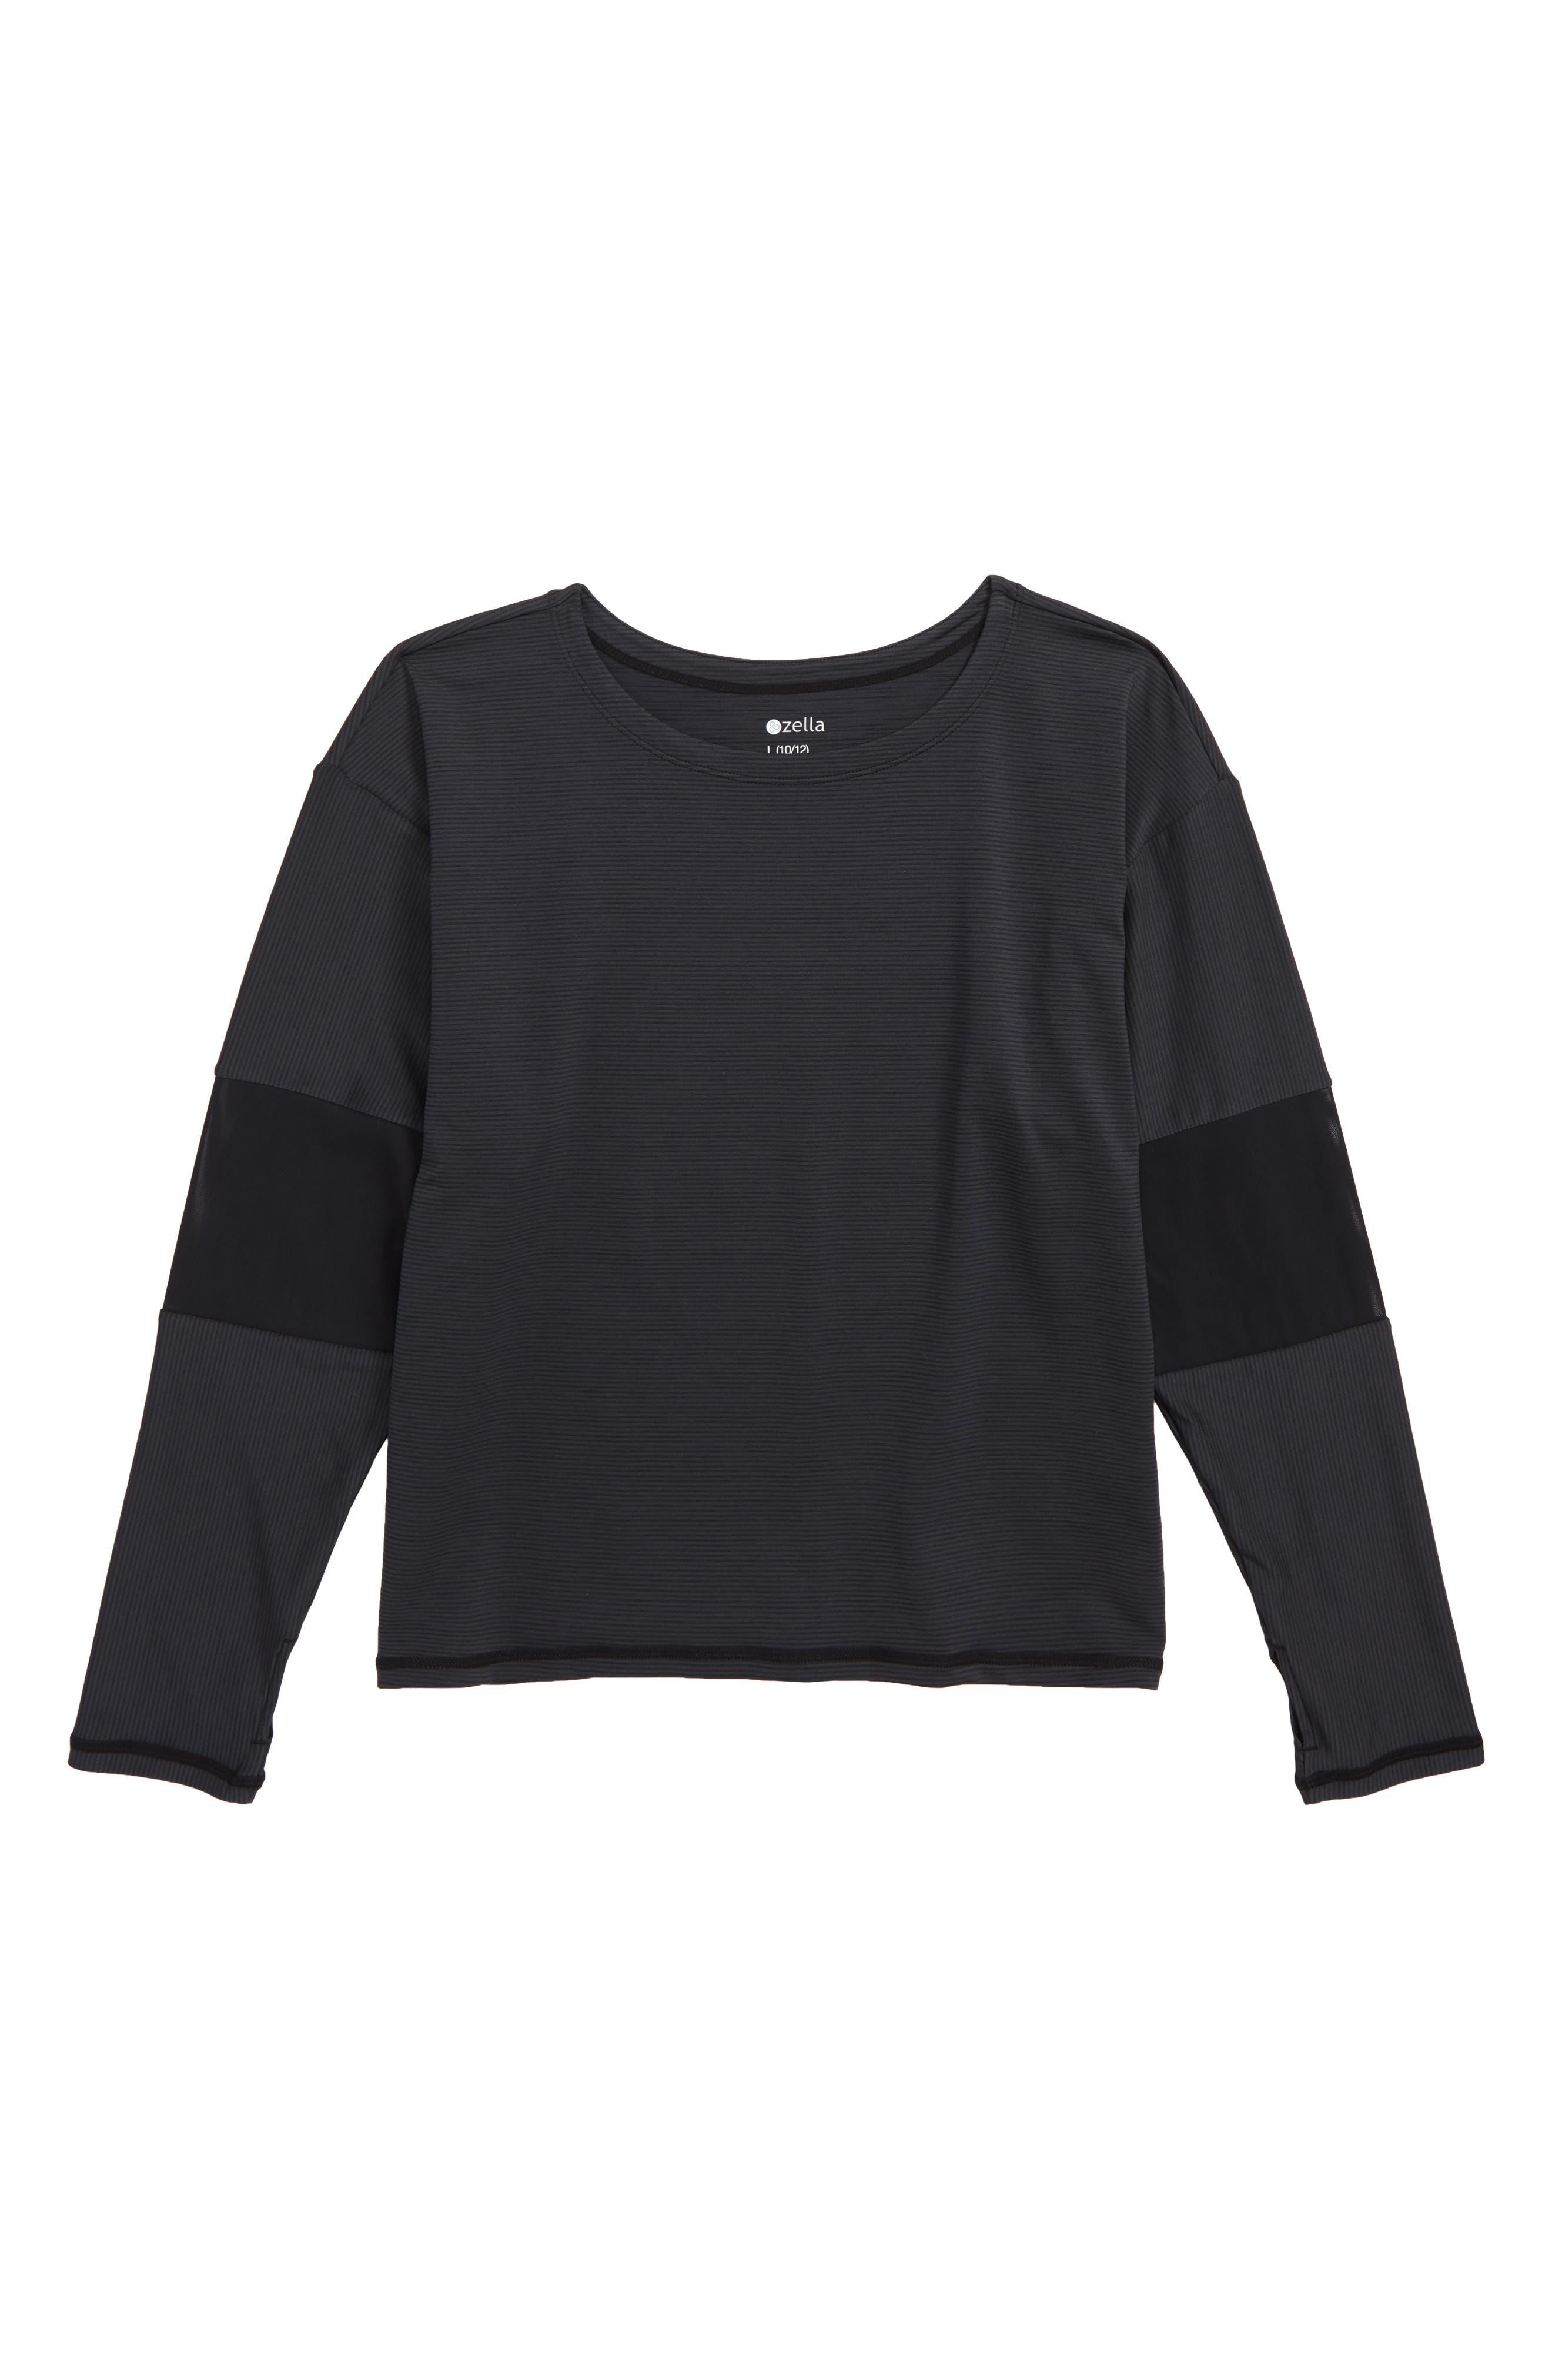 Stripe Knit & Mesh Top,                         Main,                         color, BLACK- GREY STRIPE